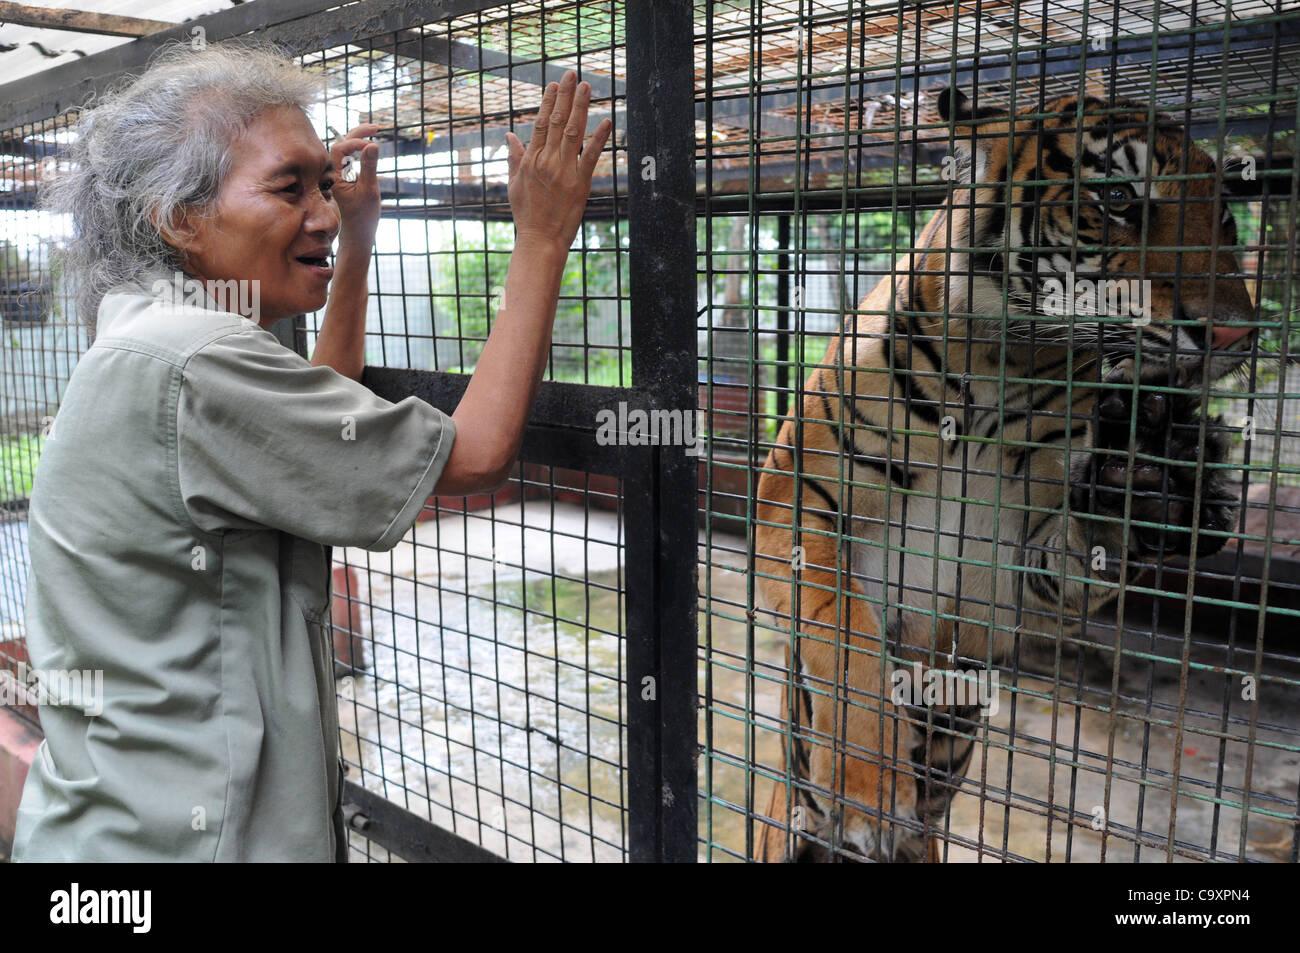 Tiger Zoo Keeper Stock Photos Amp Tiger Zoo Keeper Stock